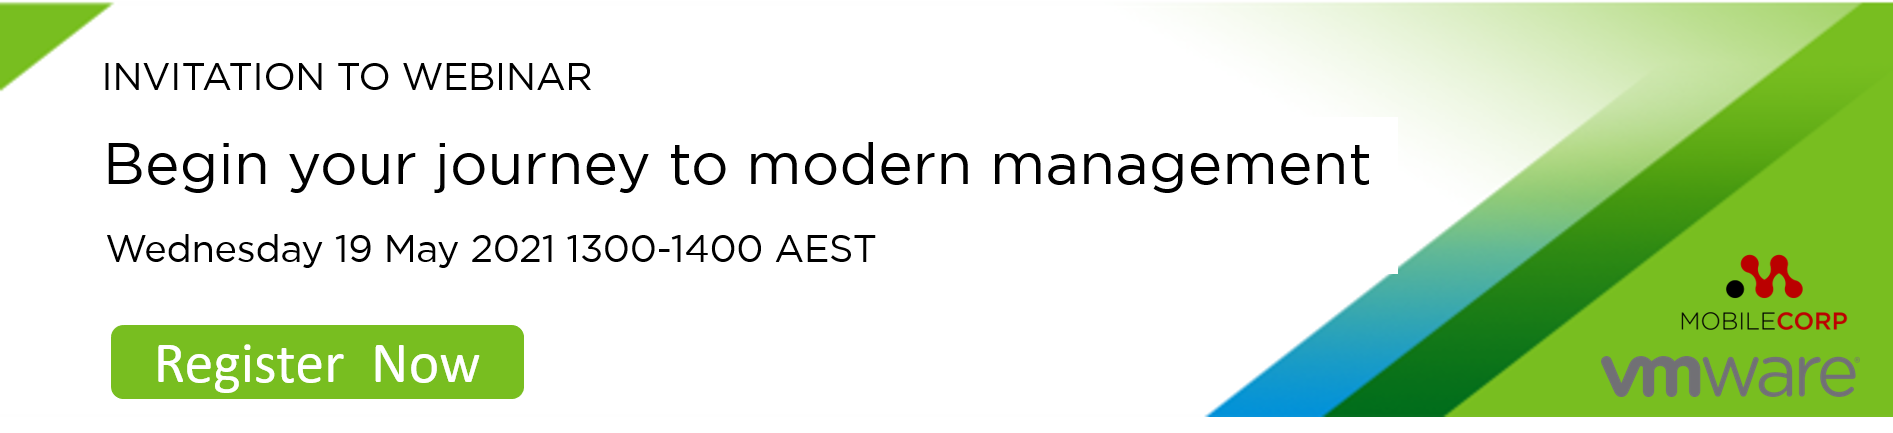 Webinar invitation - Modern Management  blog